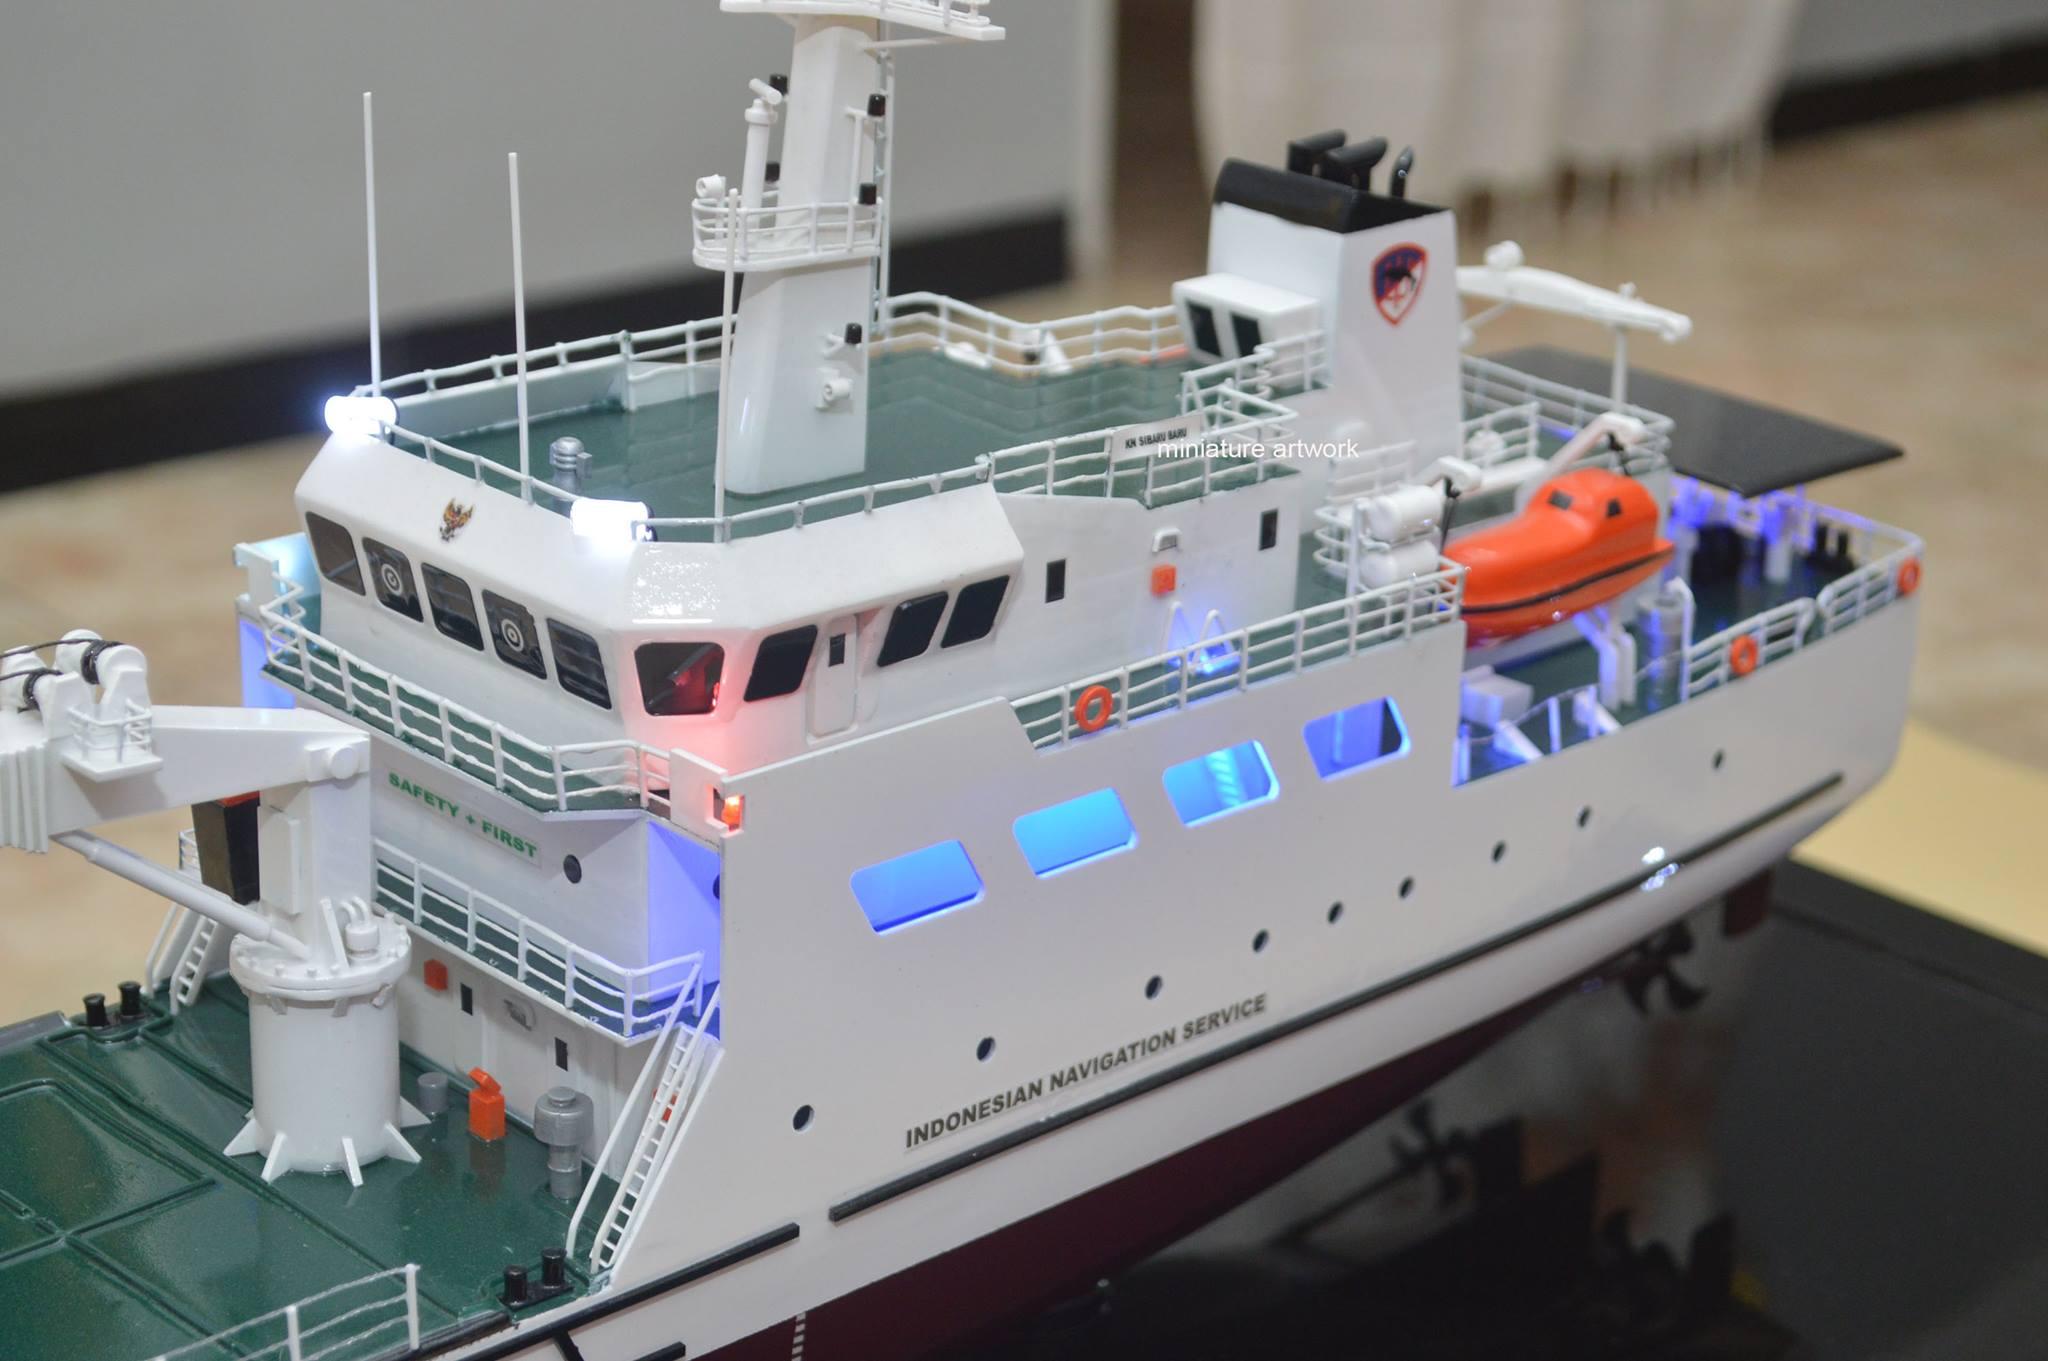 pengrajin miniatur kapal kn sibaru baru terpercaya rumpun artwork planet kapal indonesia